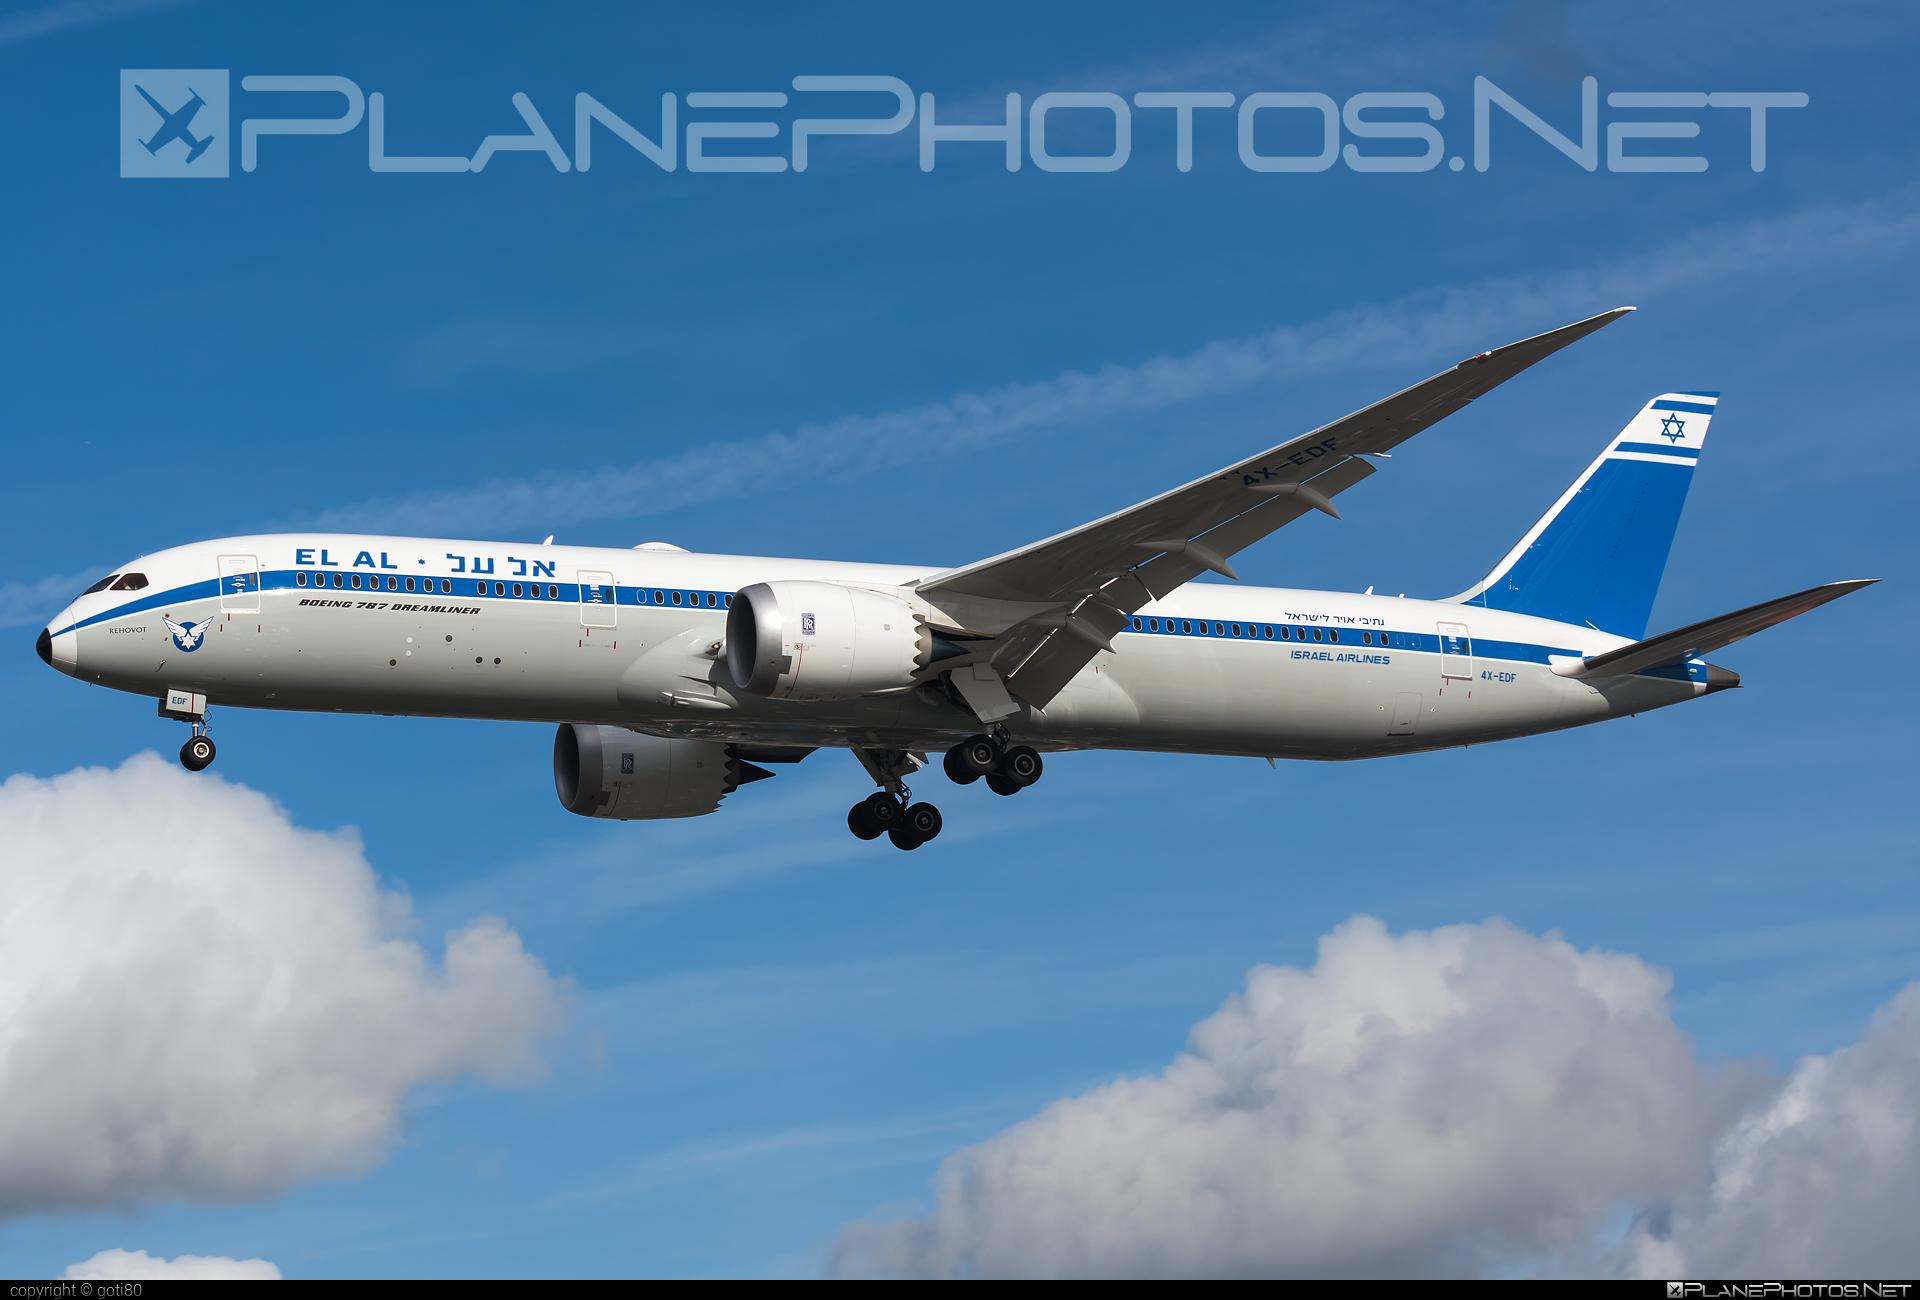 Boeing 787-9 Dreamliner - 4X-EDF operated by El Al Israel Airlines #b787 #boeing #boeing787 #dreamliner #elal #elalisraelairlines #israelairlines